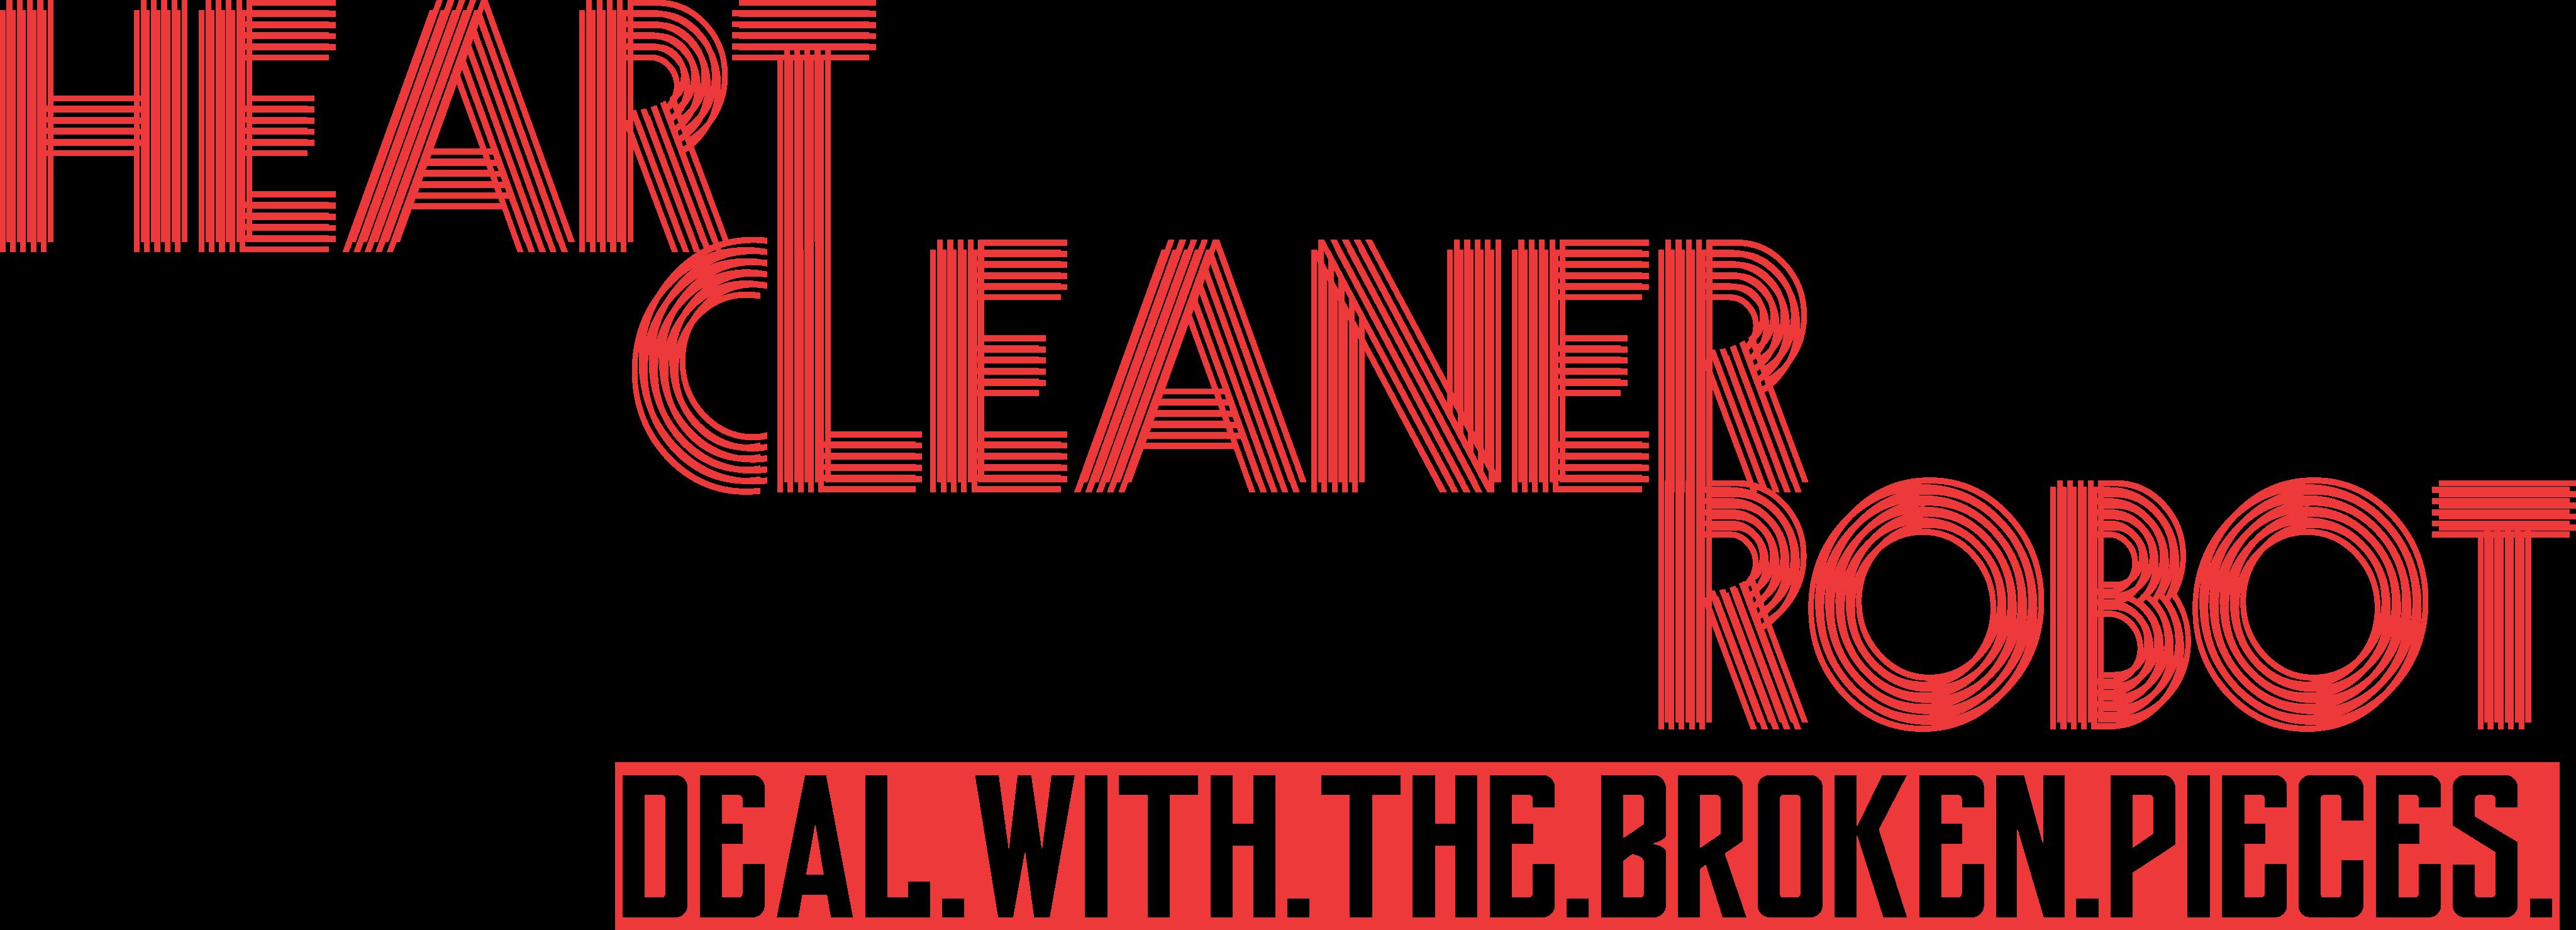 Heart Cleaner Robot